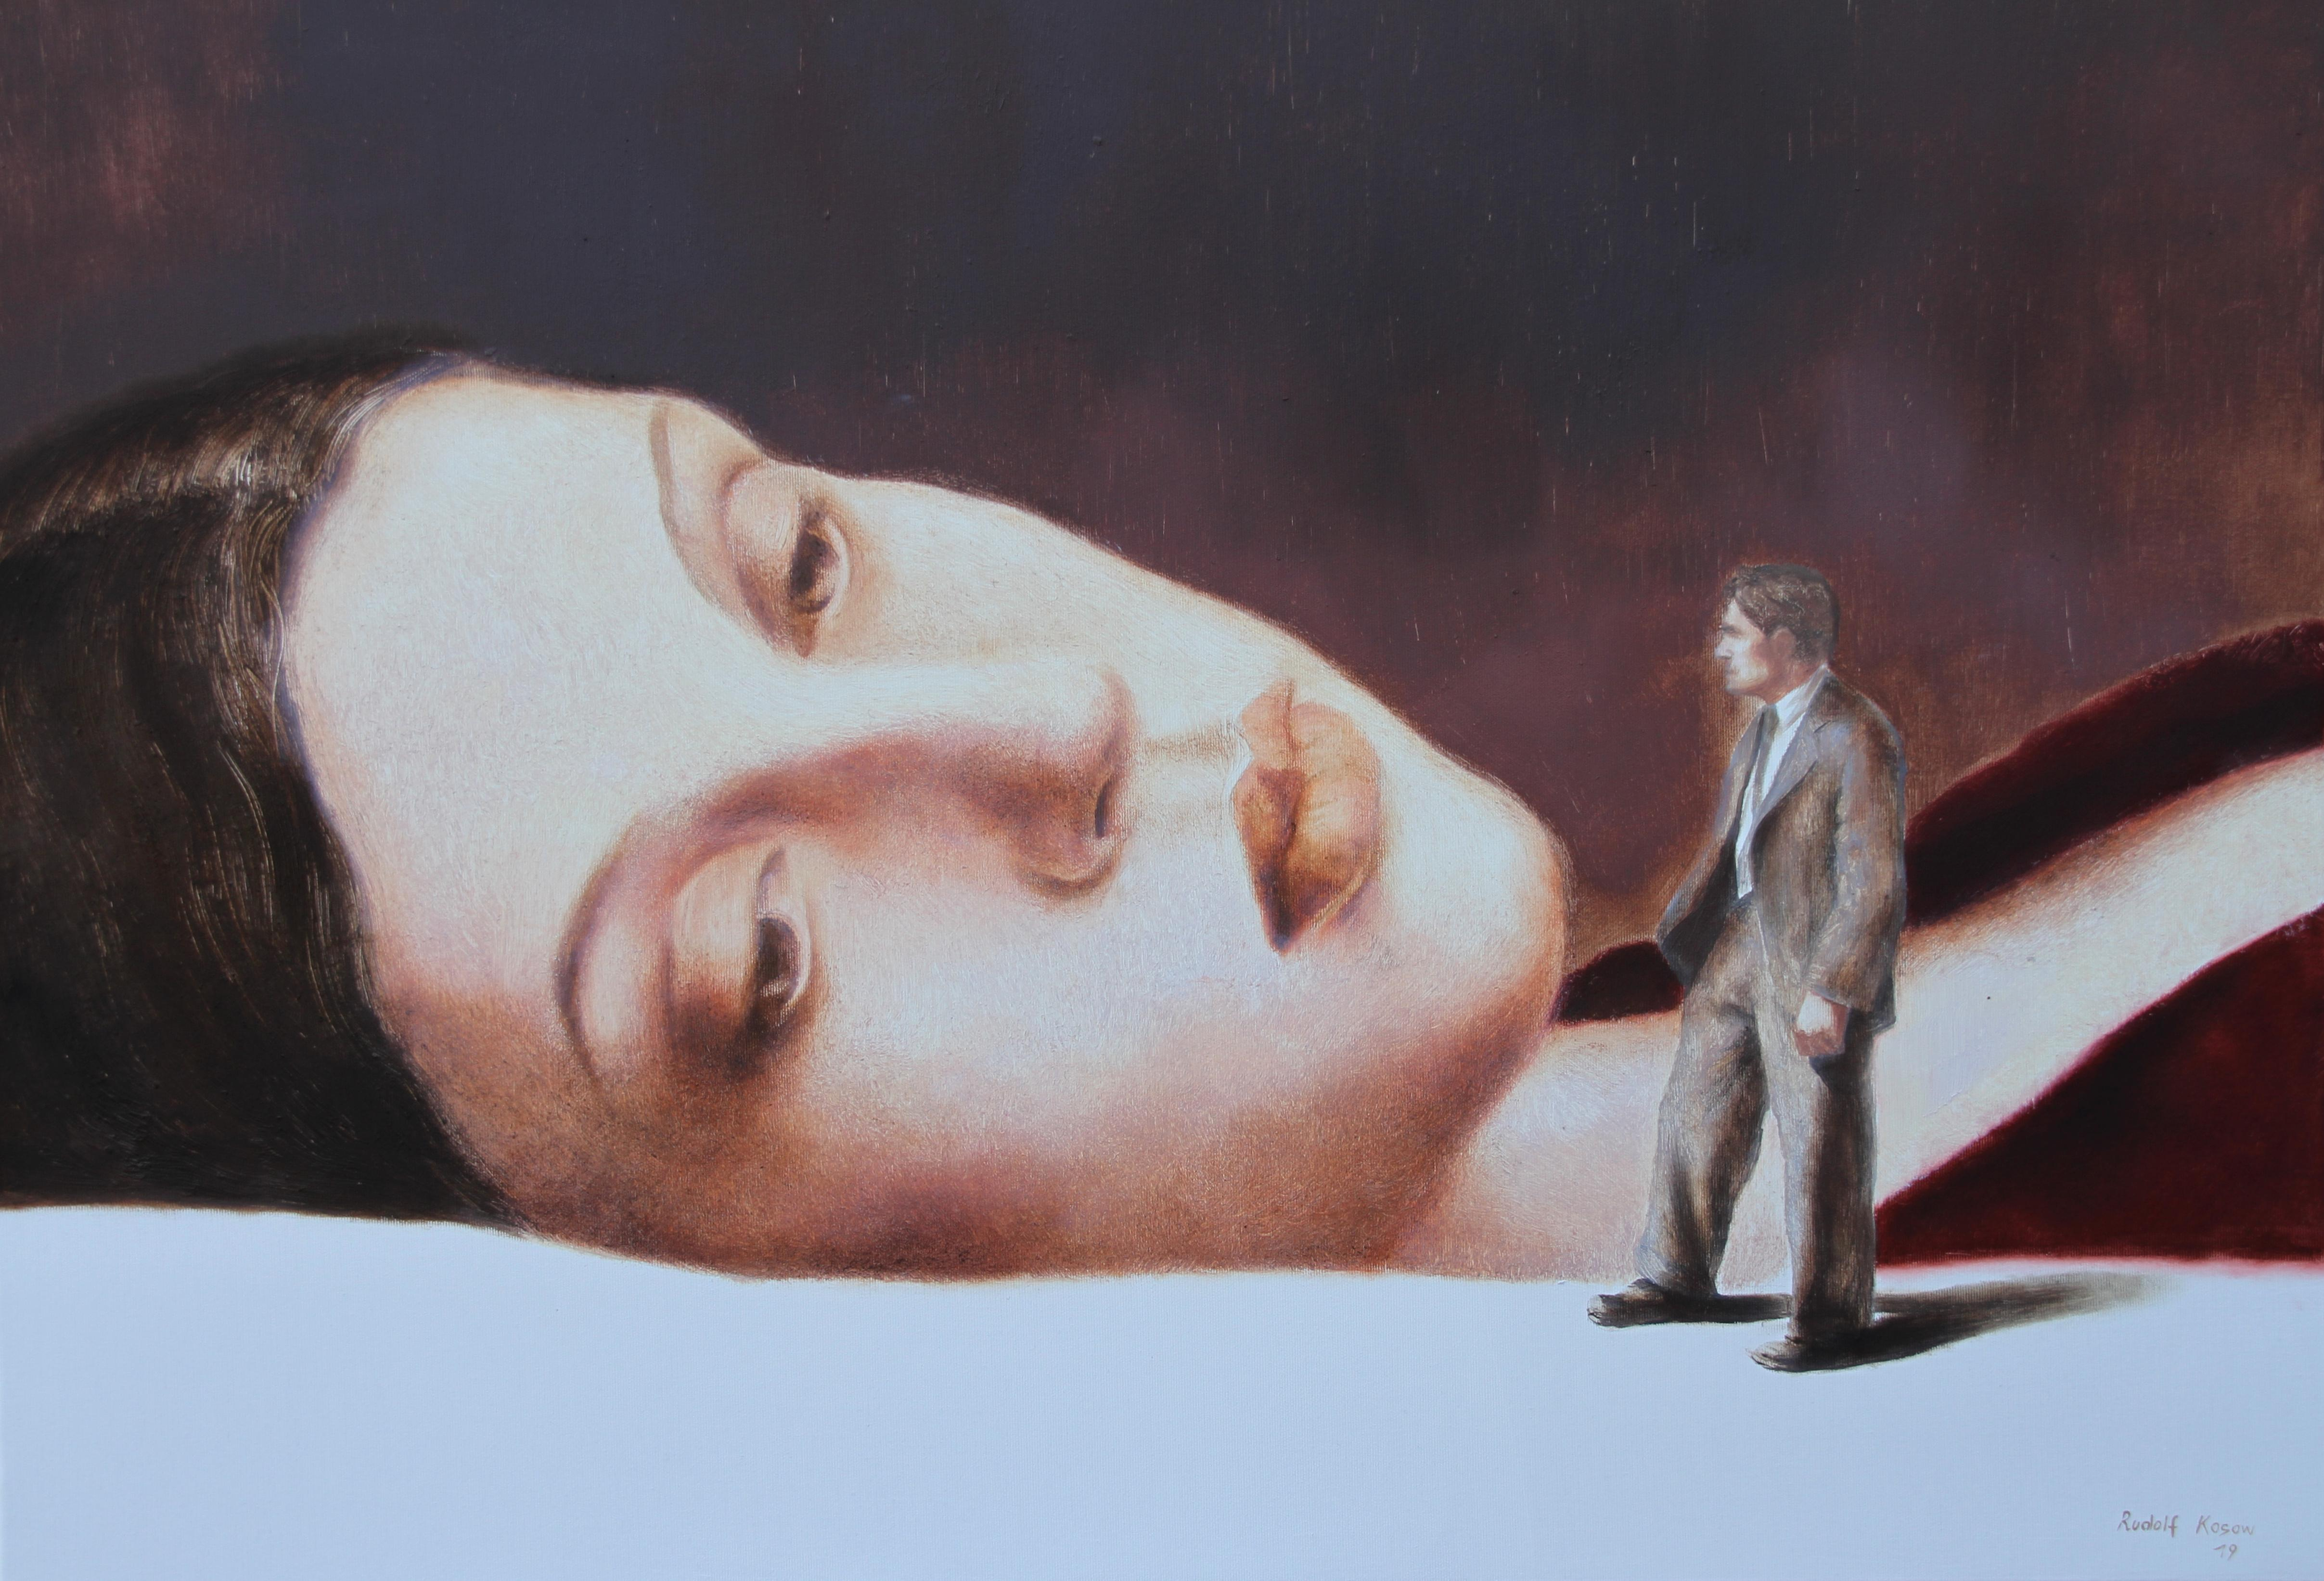 Couple (oil painting flesh tones vintage couple sleeping beauty nostalgia)